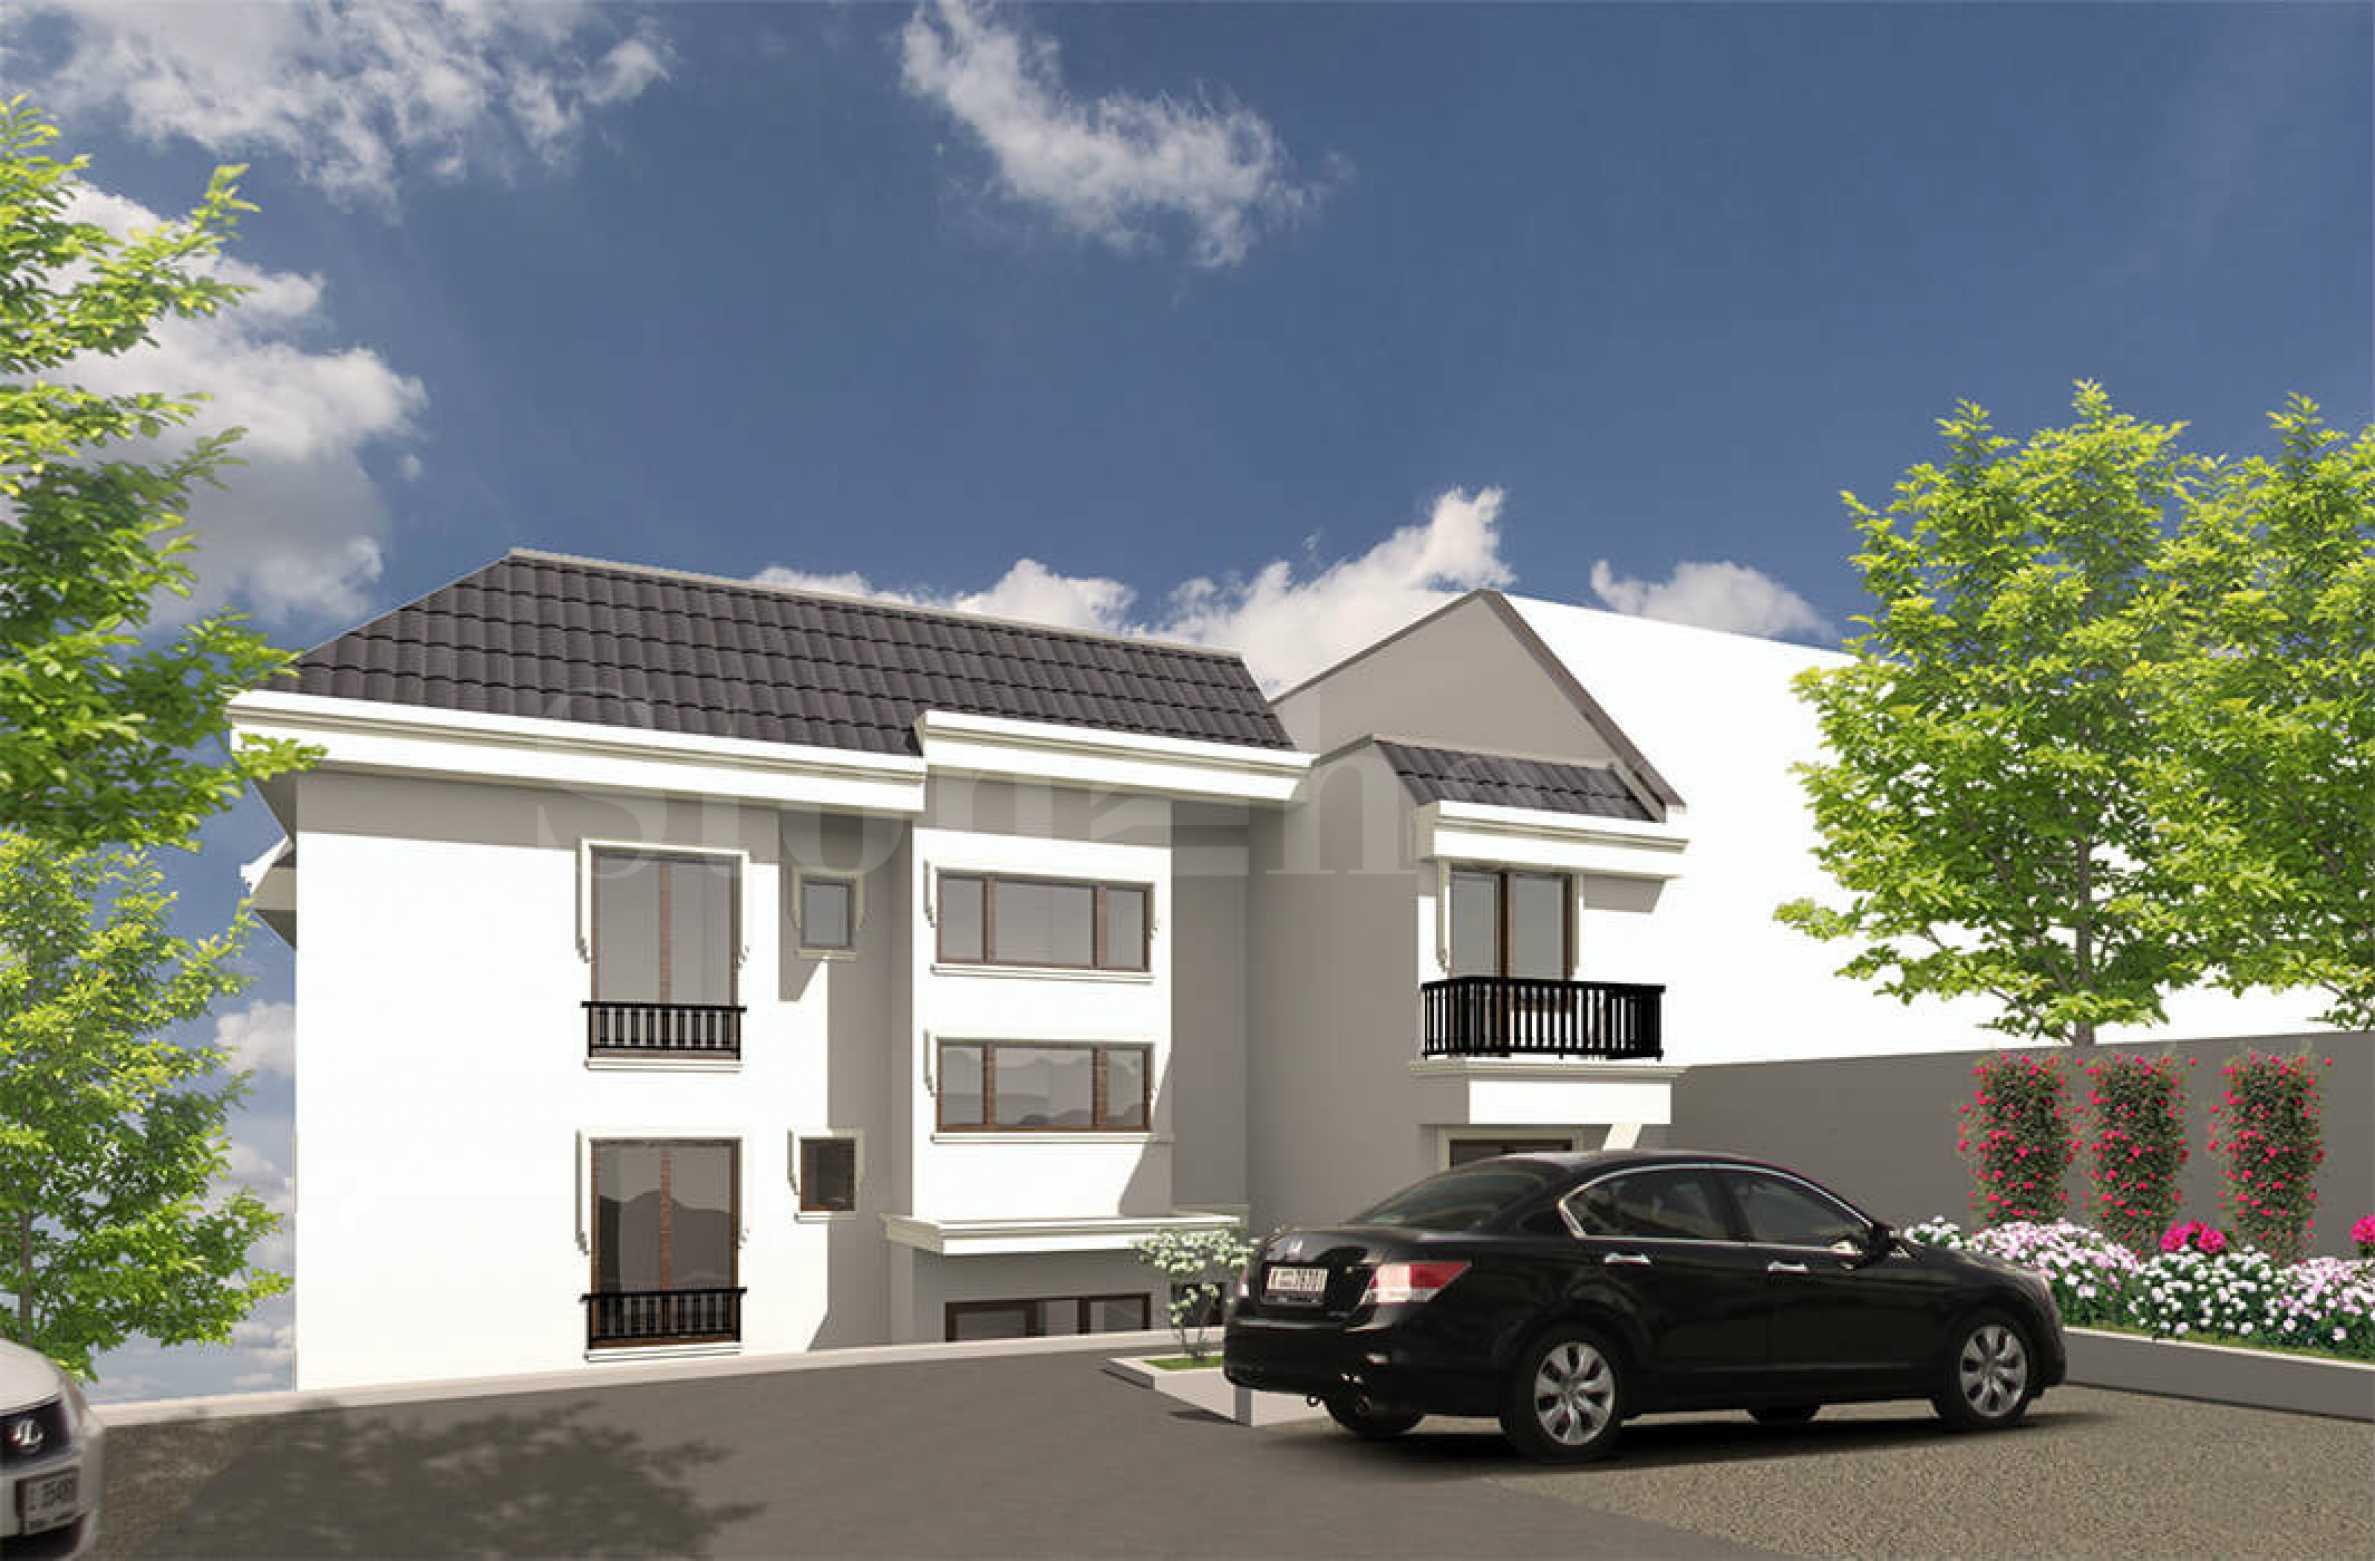 Excellent residential building in Evksinograd area near Varna2 - Stonehard